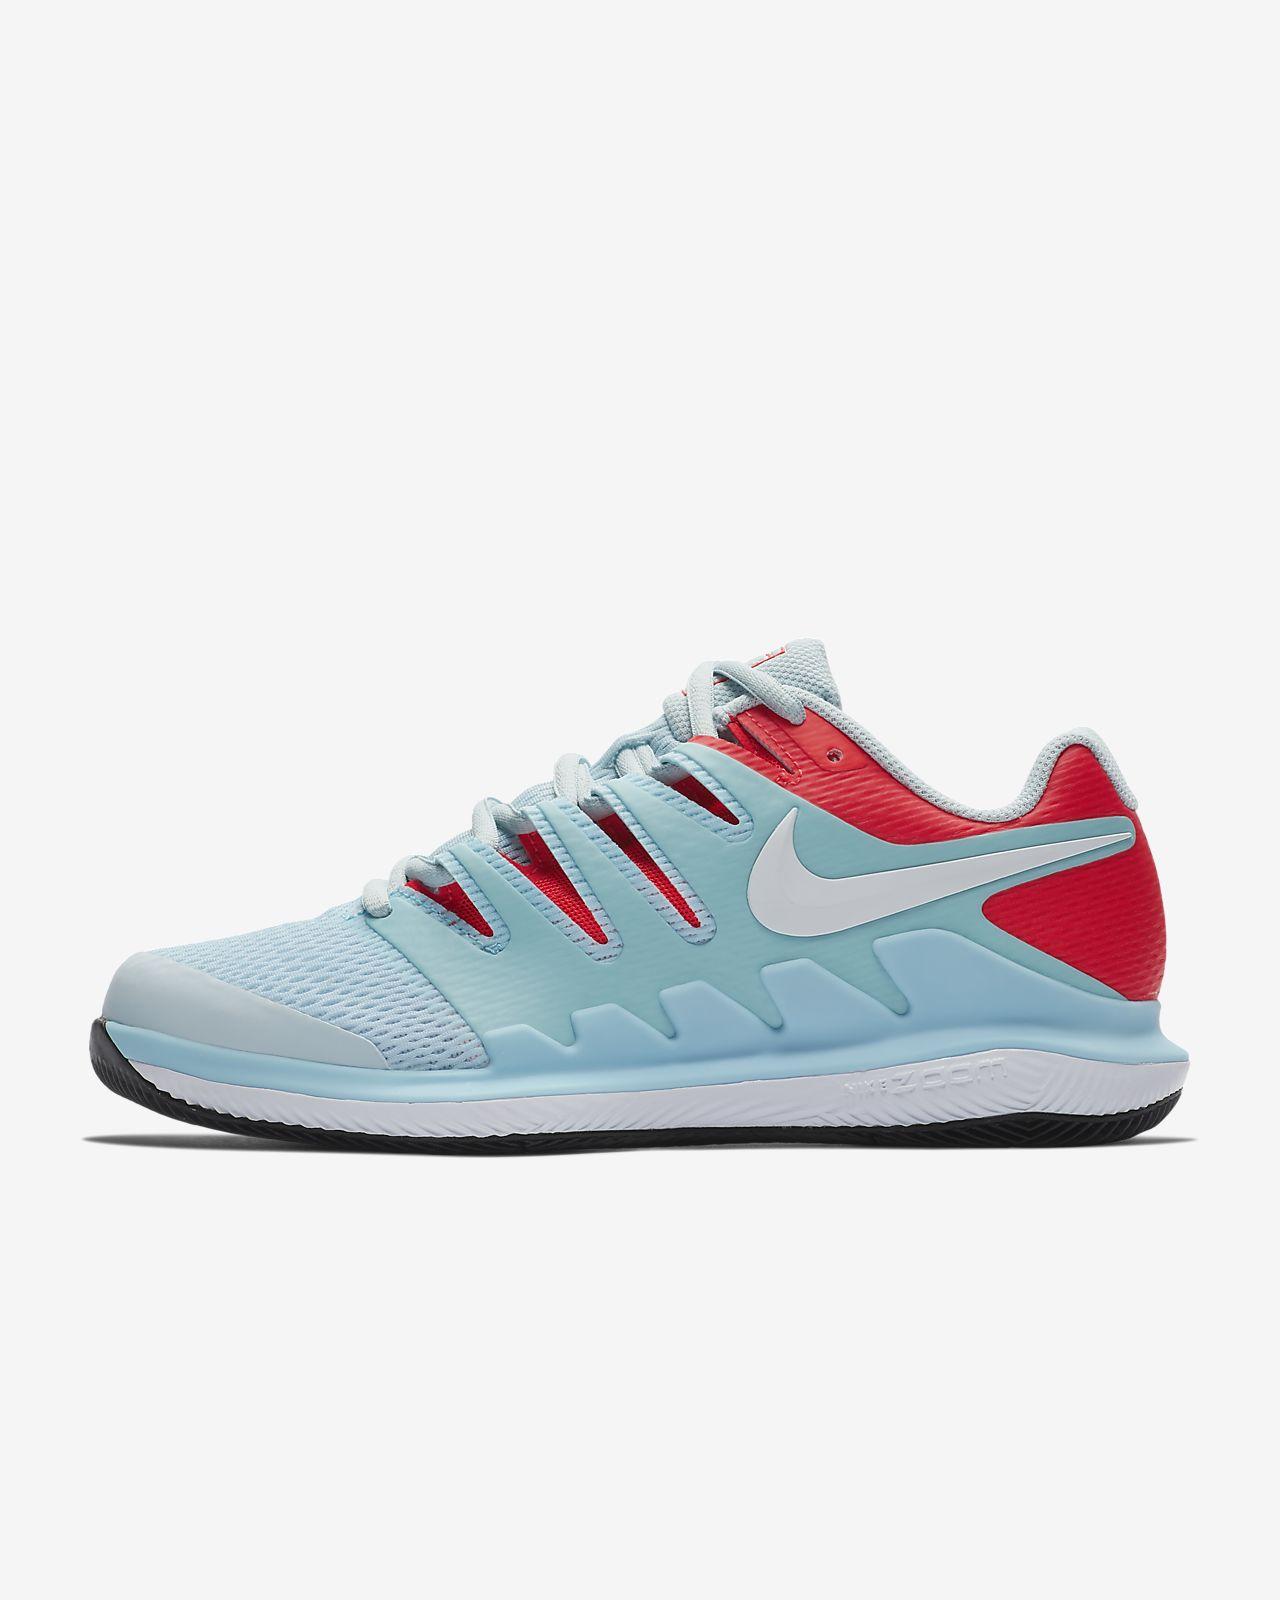 NikeCourt Air Zoom Vapor X-hardcourt-tennissko til kvinder. Nike.com DK 25675068a9